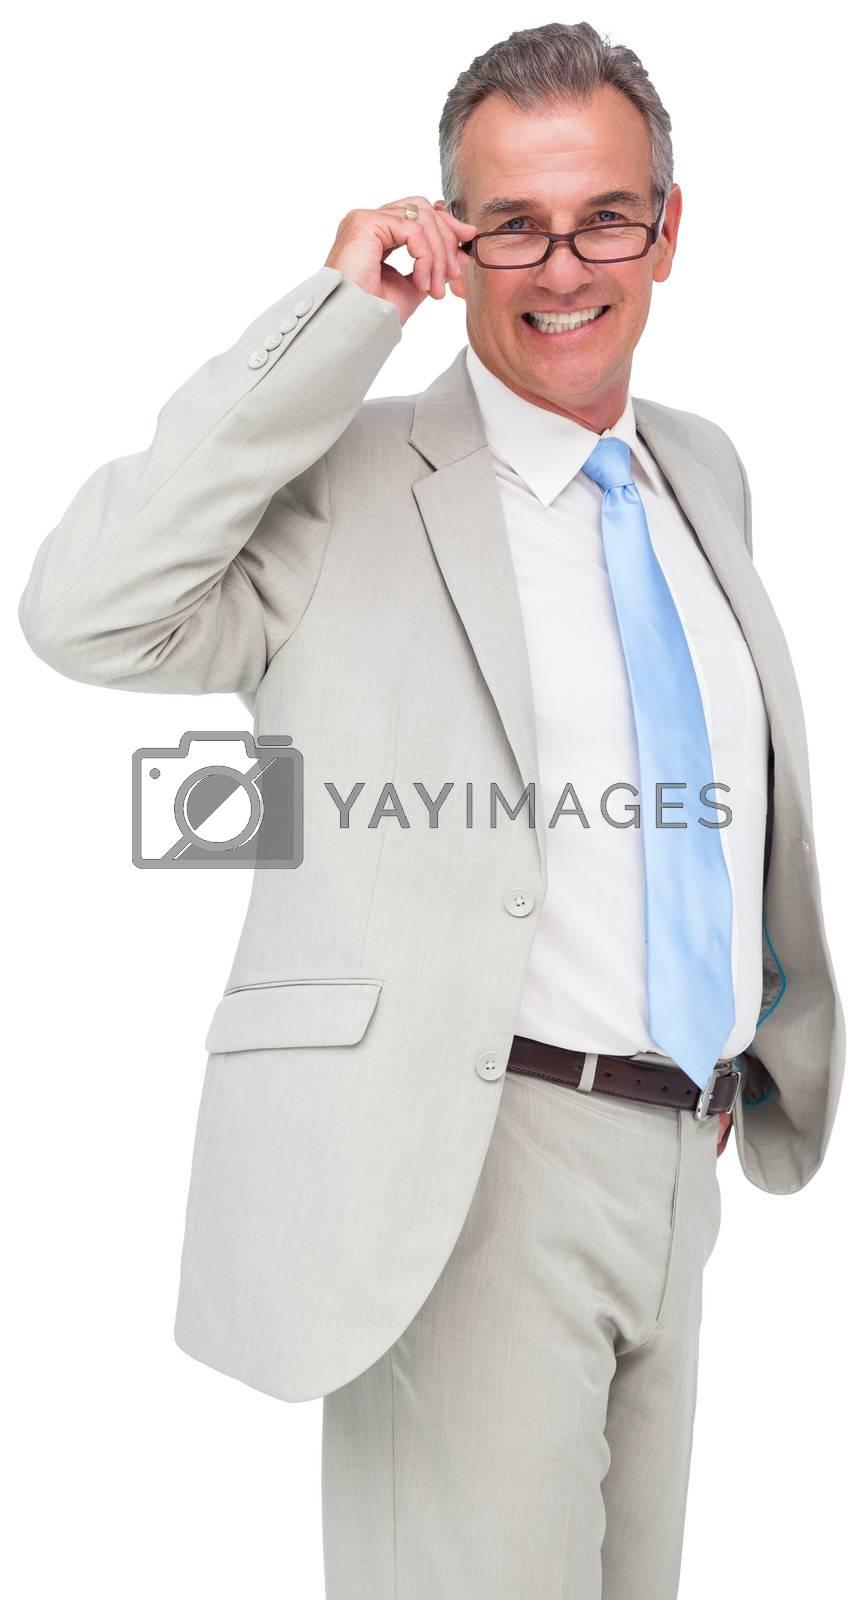 Royalty free image of Thinking mature businessman touching glasses by Wavebreakmedia